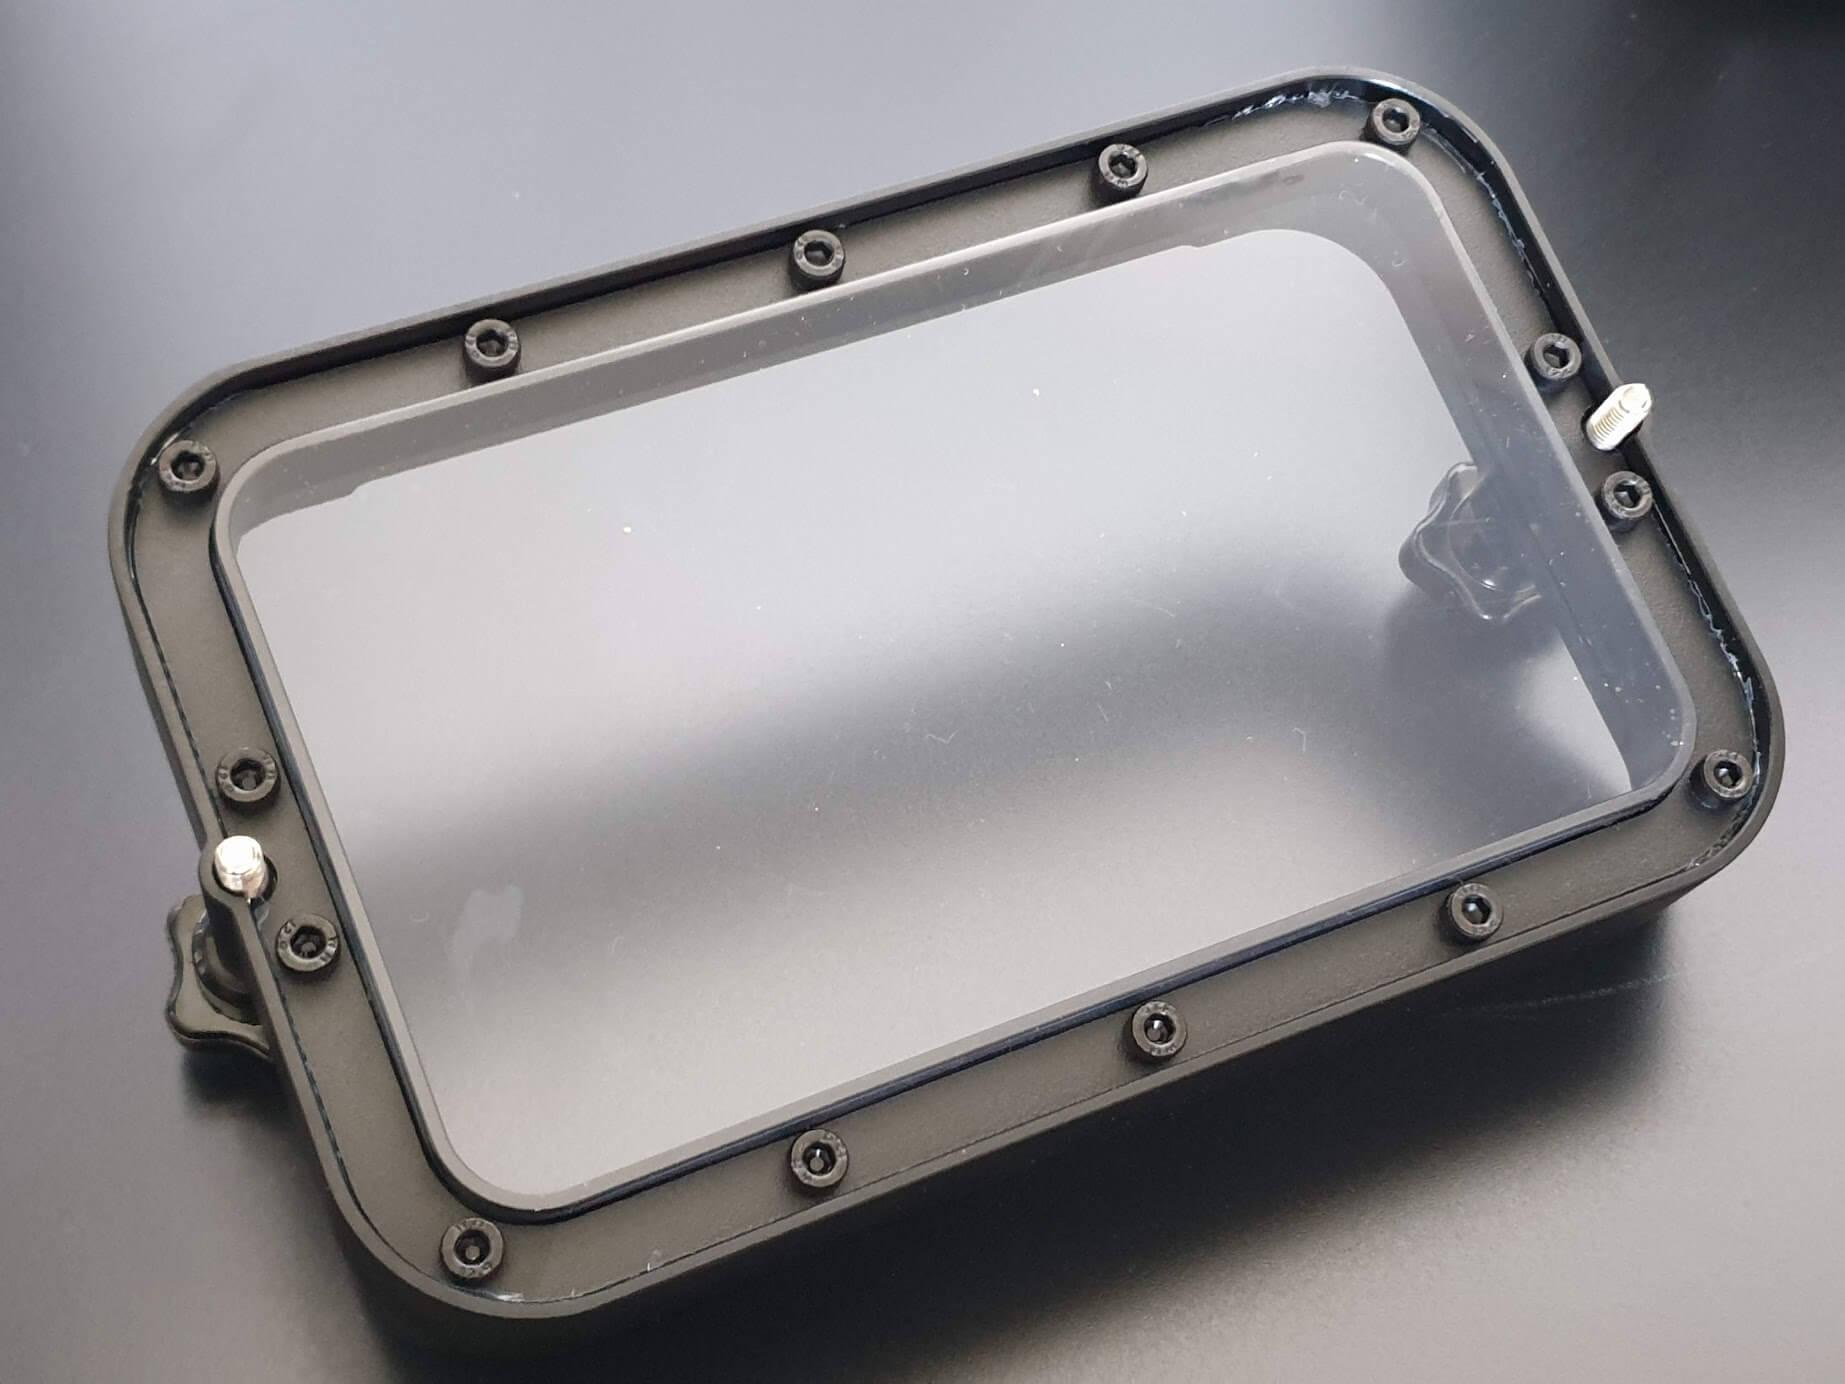 Creality-LD-002R-Metal-Vat-2